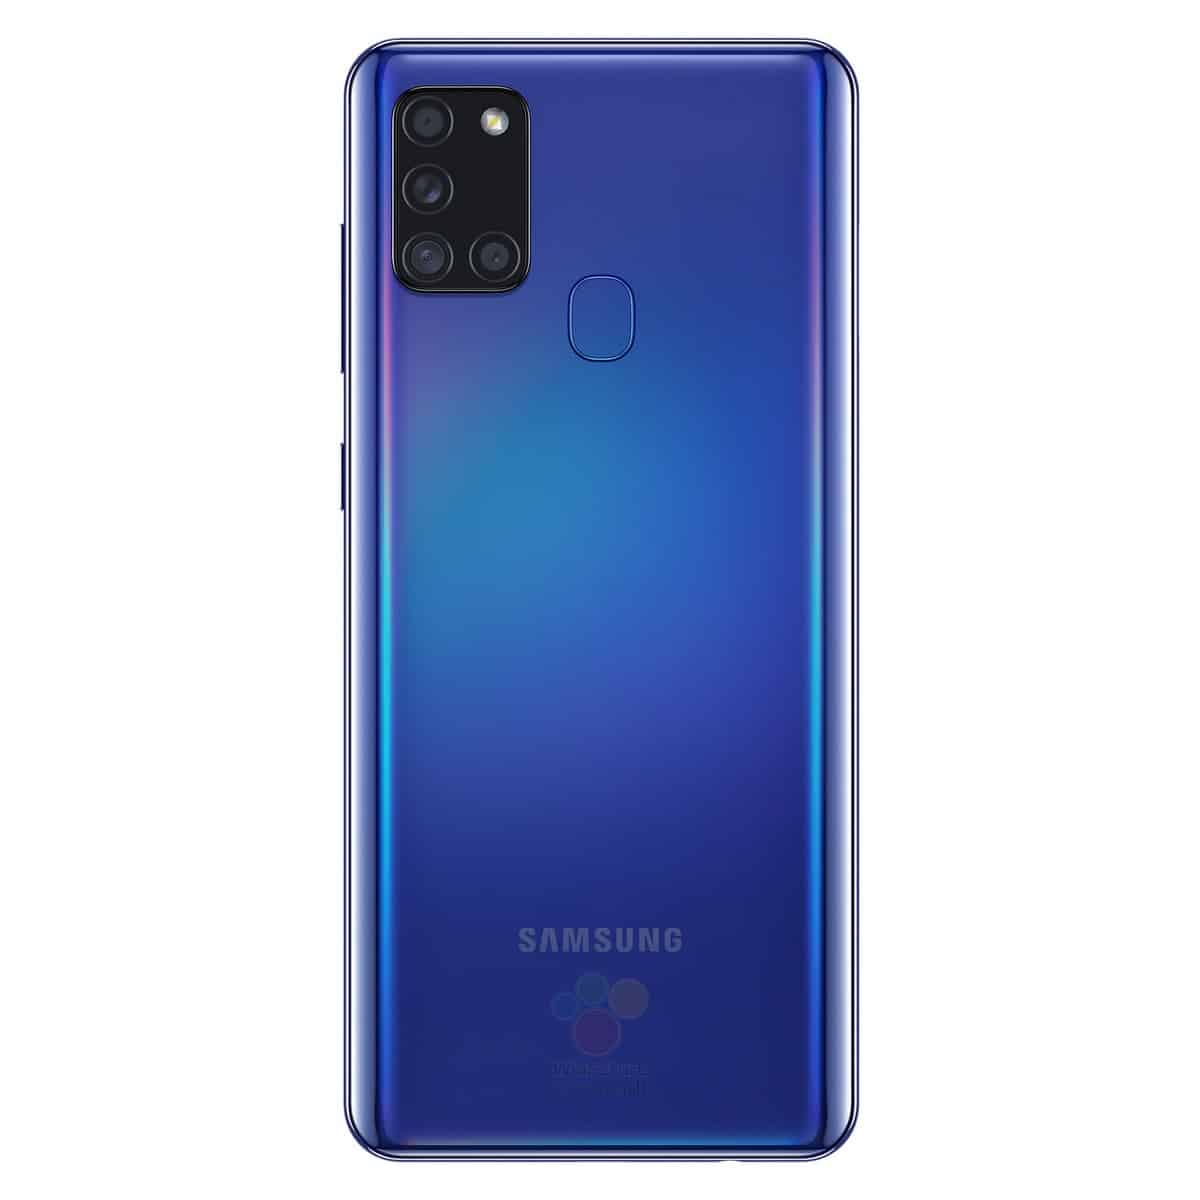 Galaxy A21s blue leak render image 1